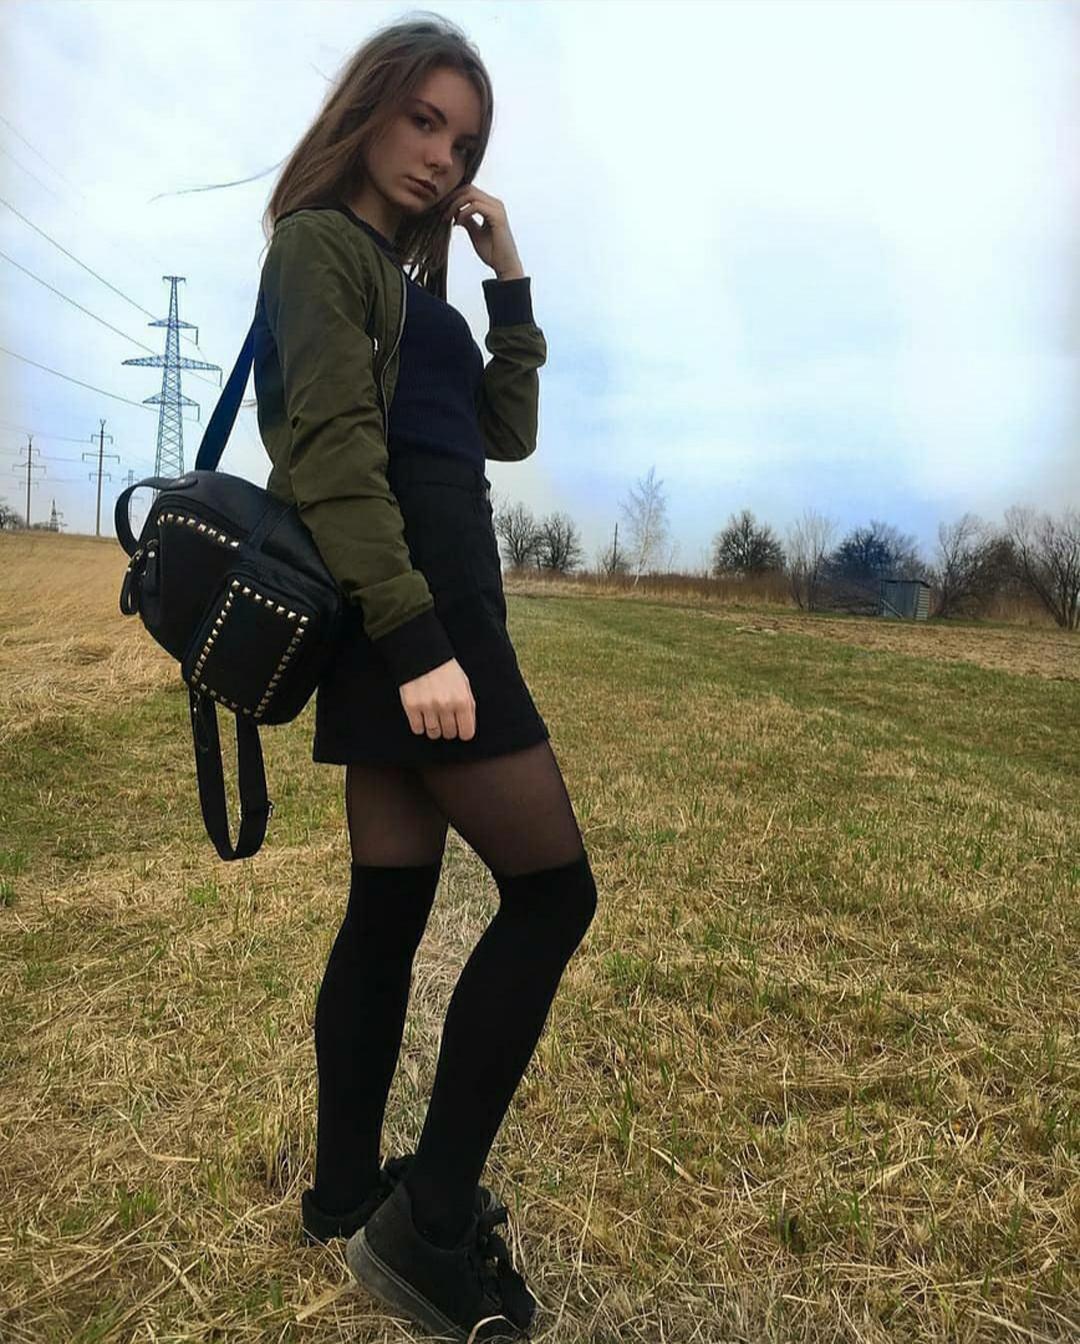 Christin-Black-Wallpapers-Insta-Fit-Bio-1